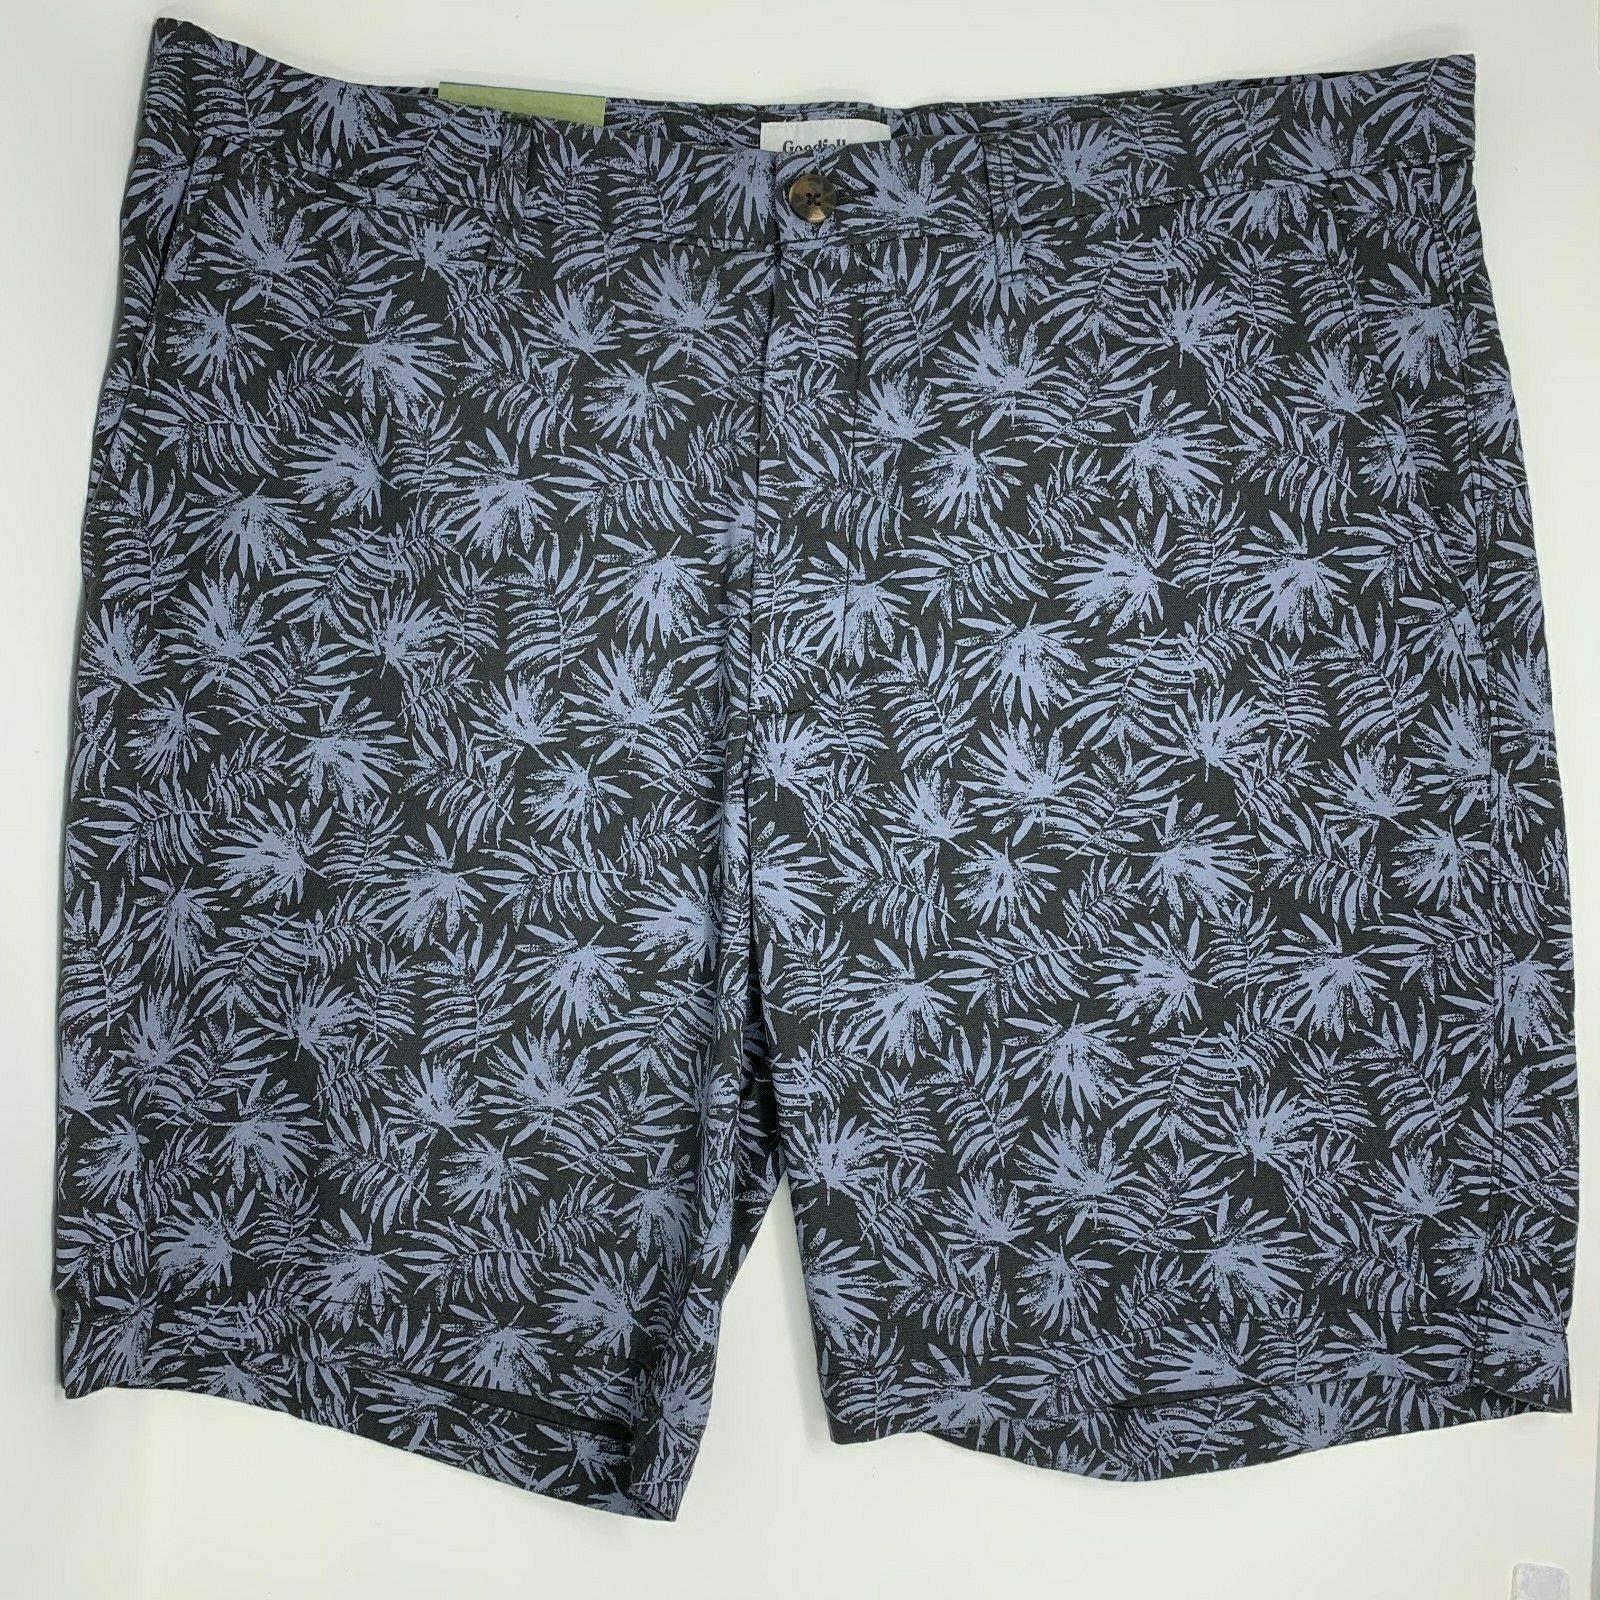 Goodfellow Linden Print Botanical Shorts